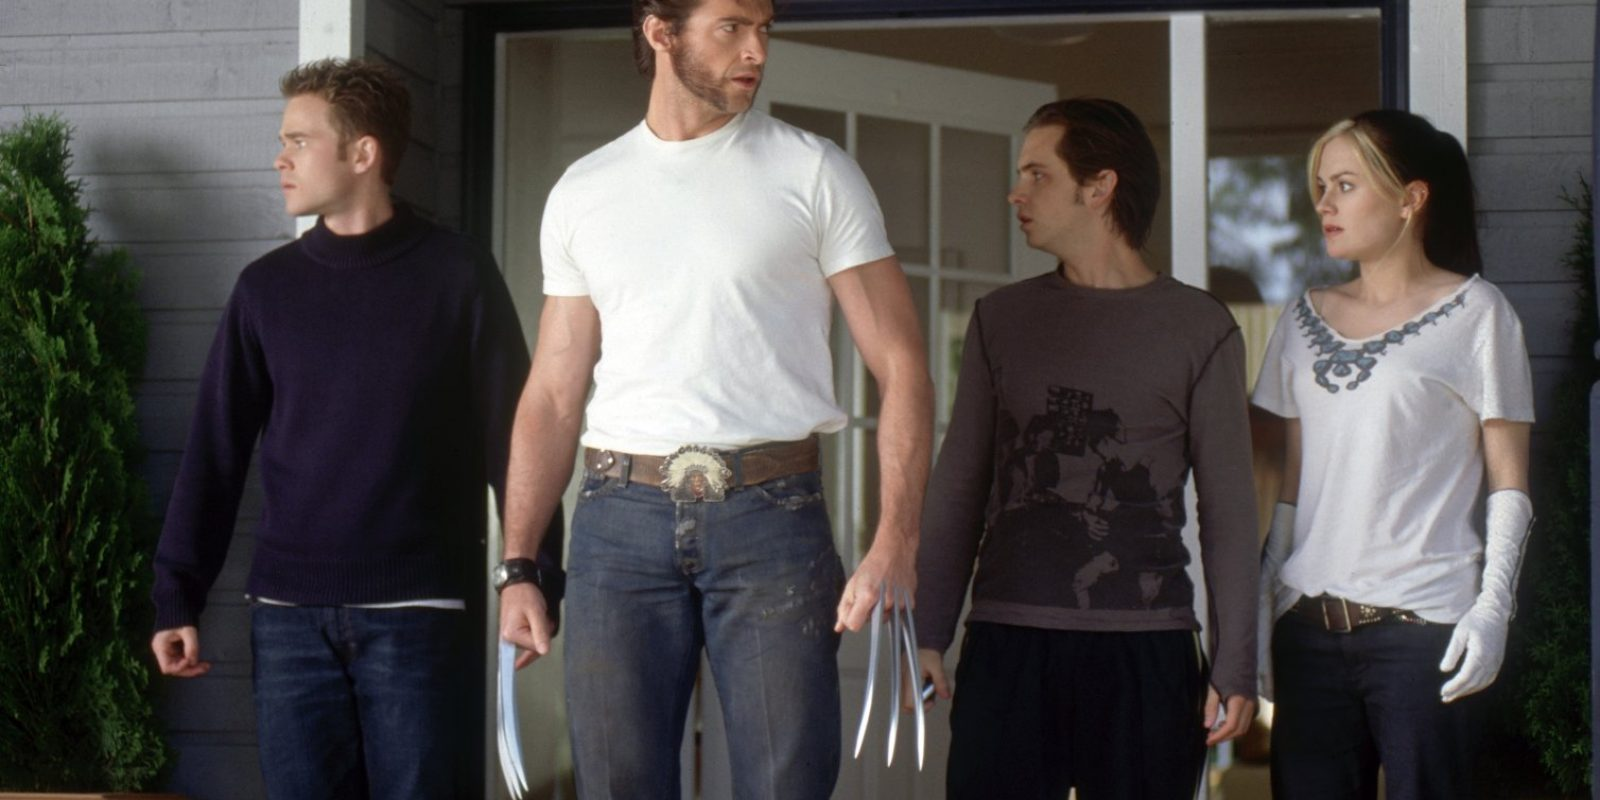 2003: X-Men 2